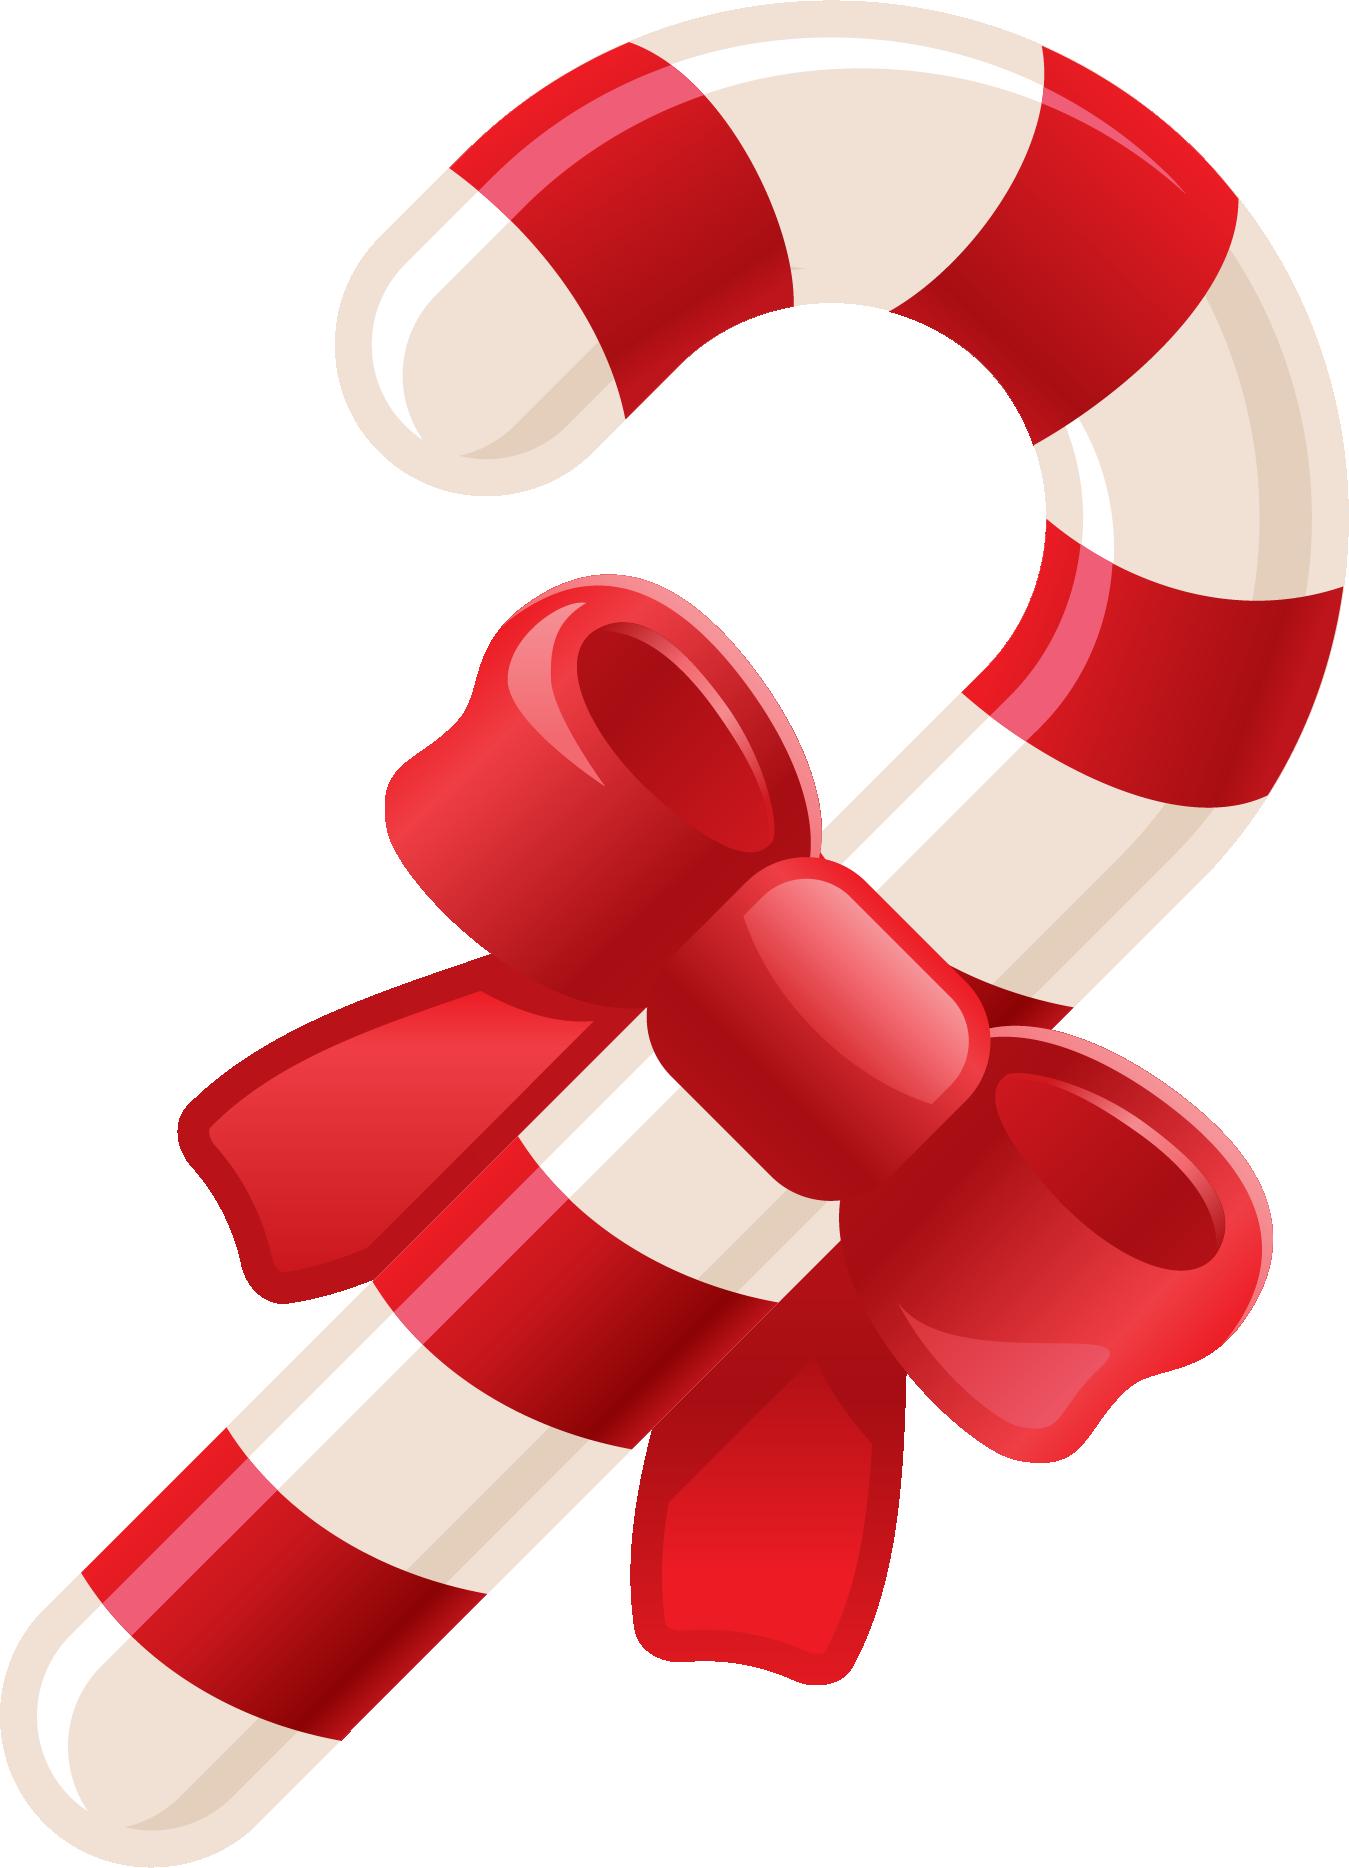 Happy Holidays Clip Art Happy Holidays Clip Art Happy Holidays Clip